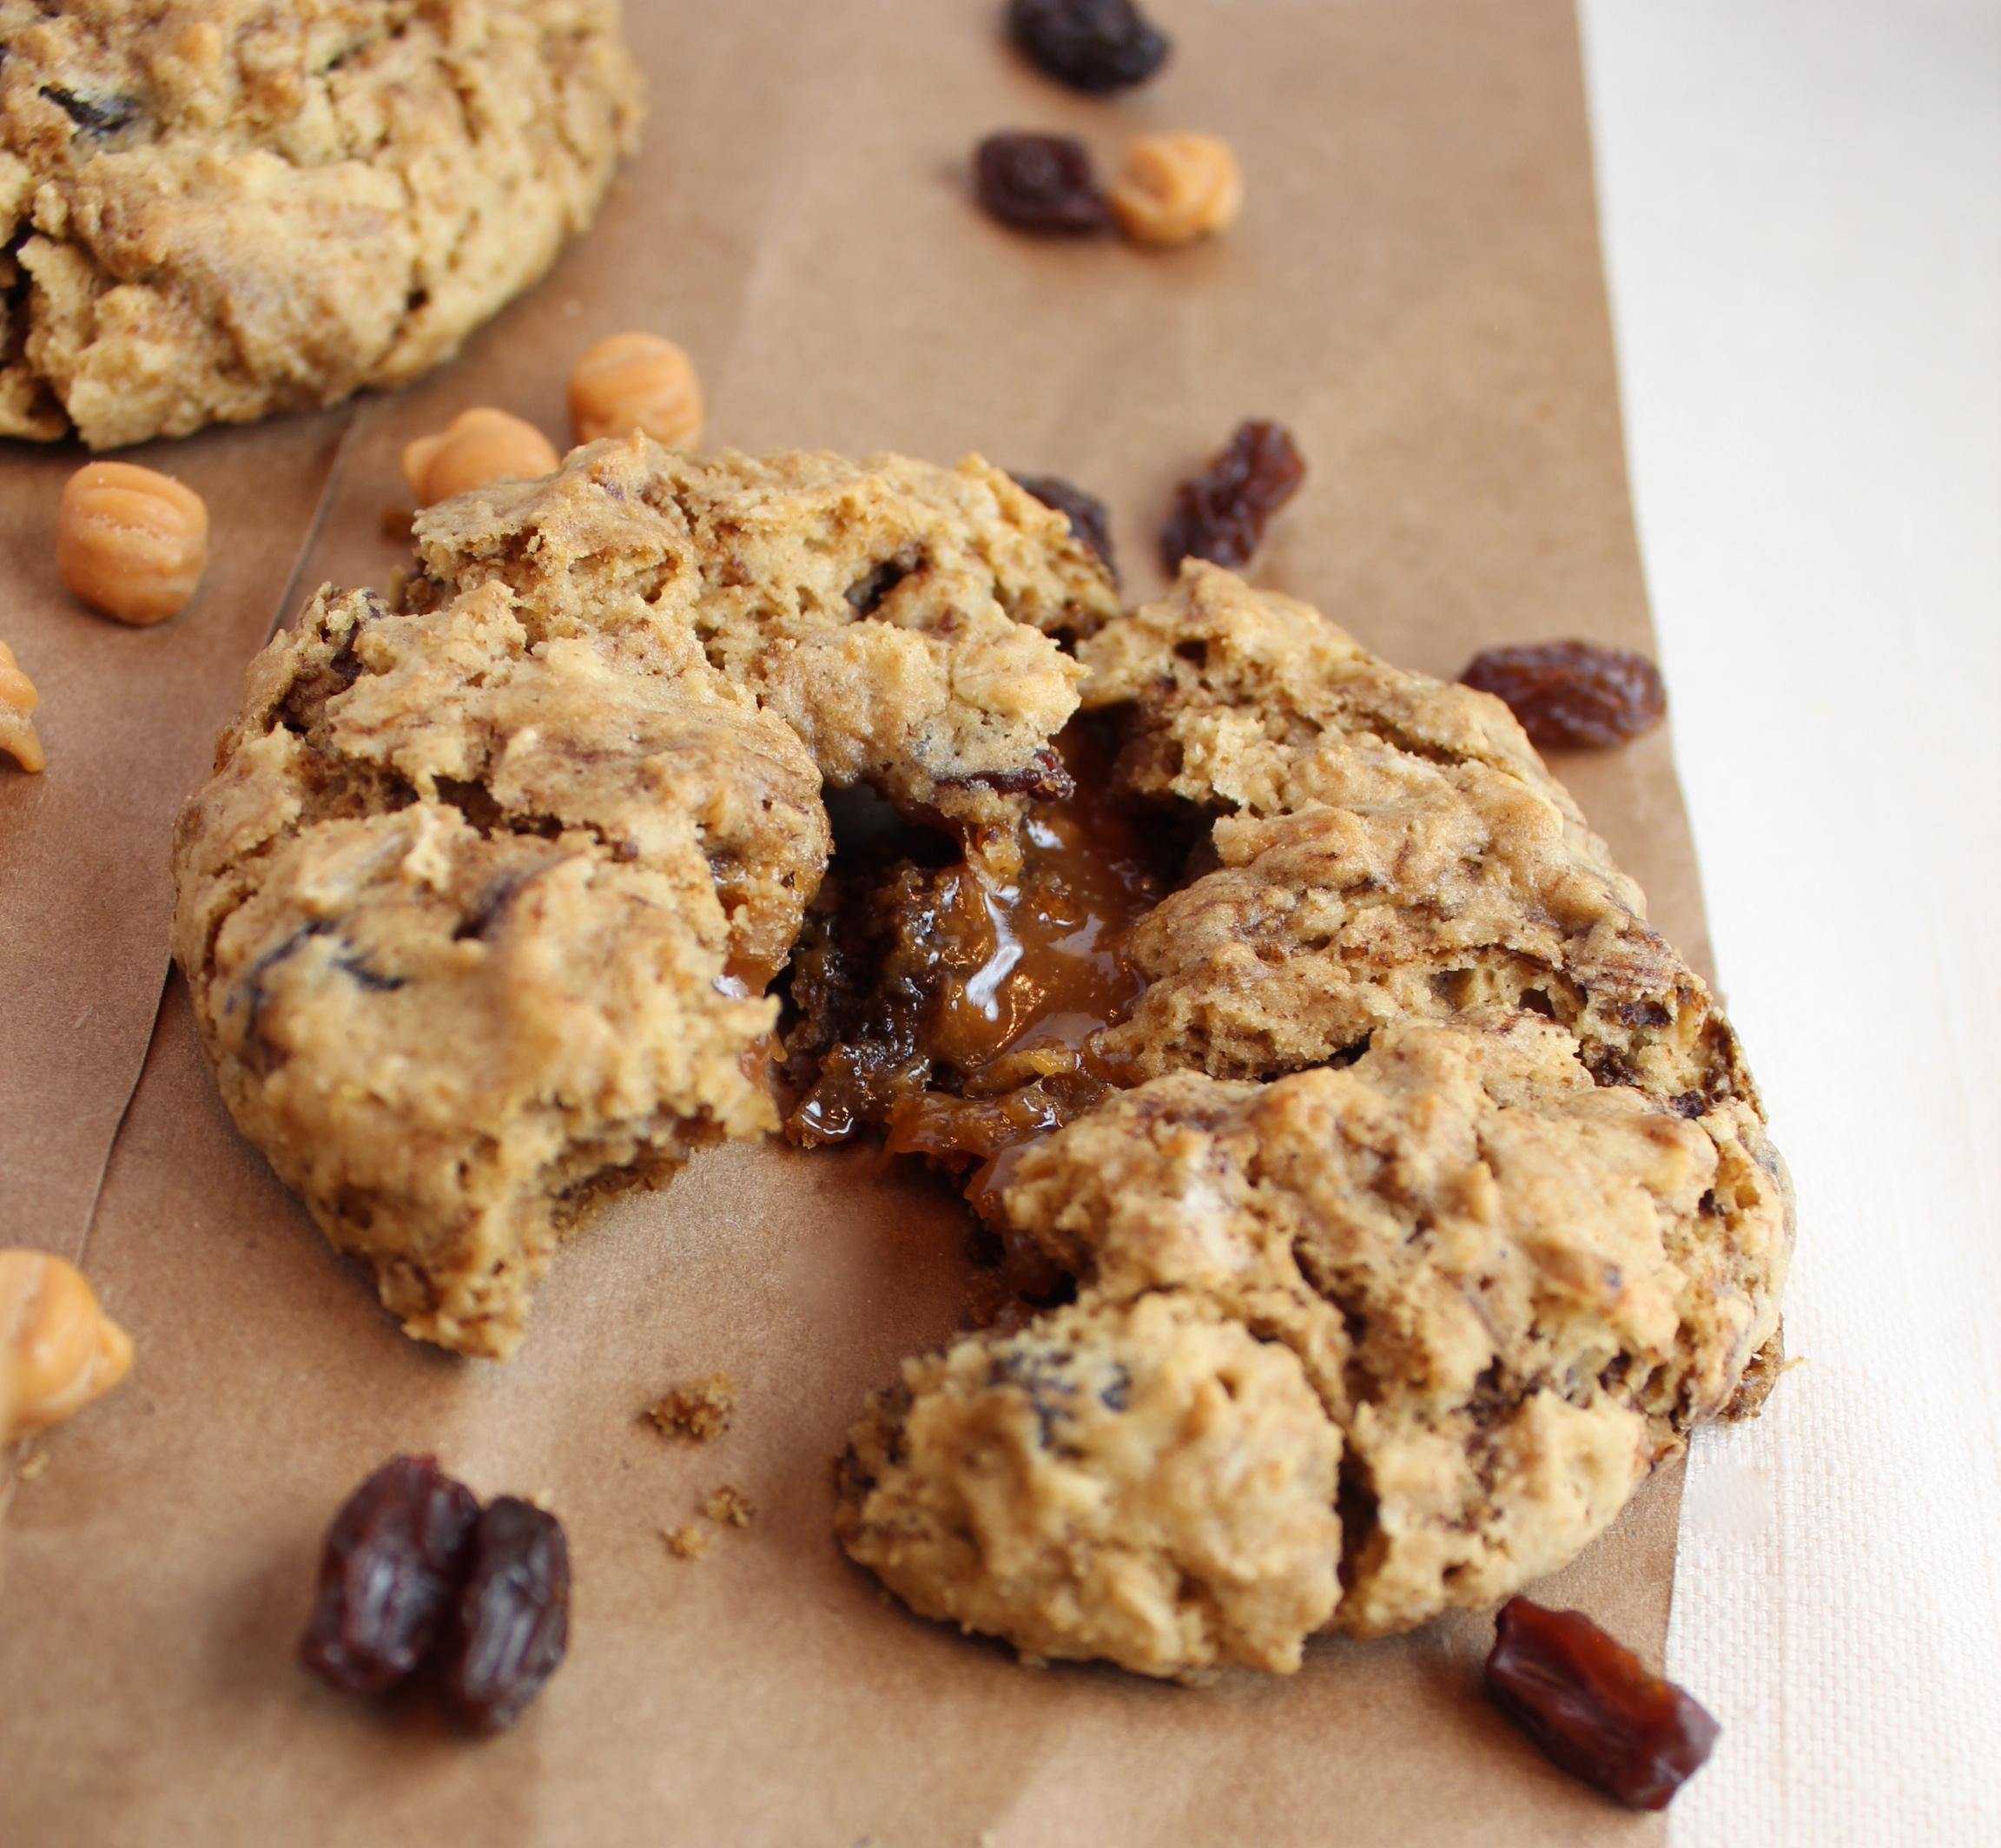 Gluten Free Oatmeal Raisin Caramel Cookies